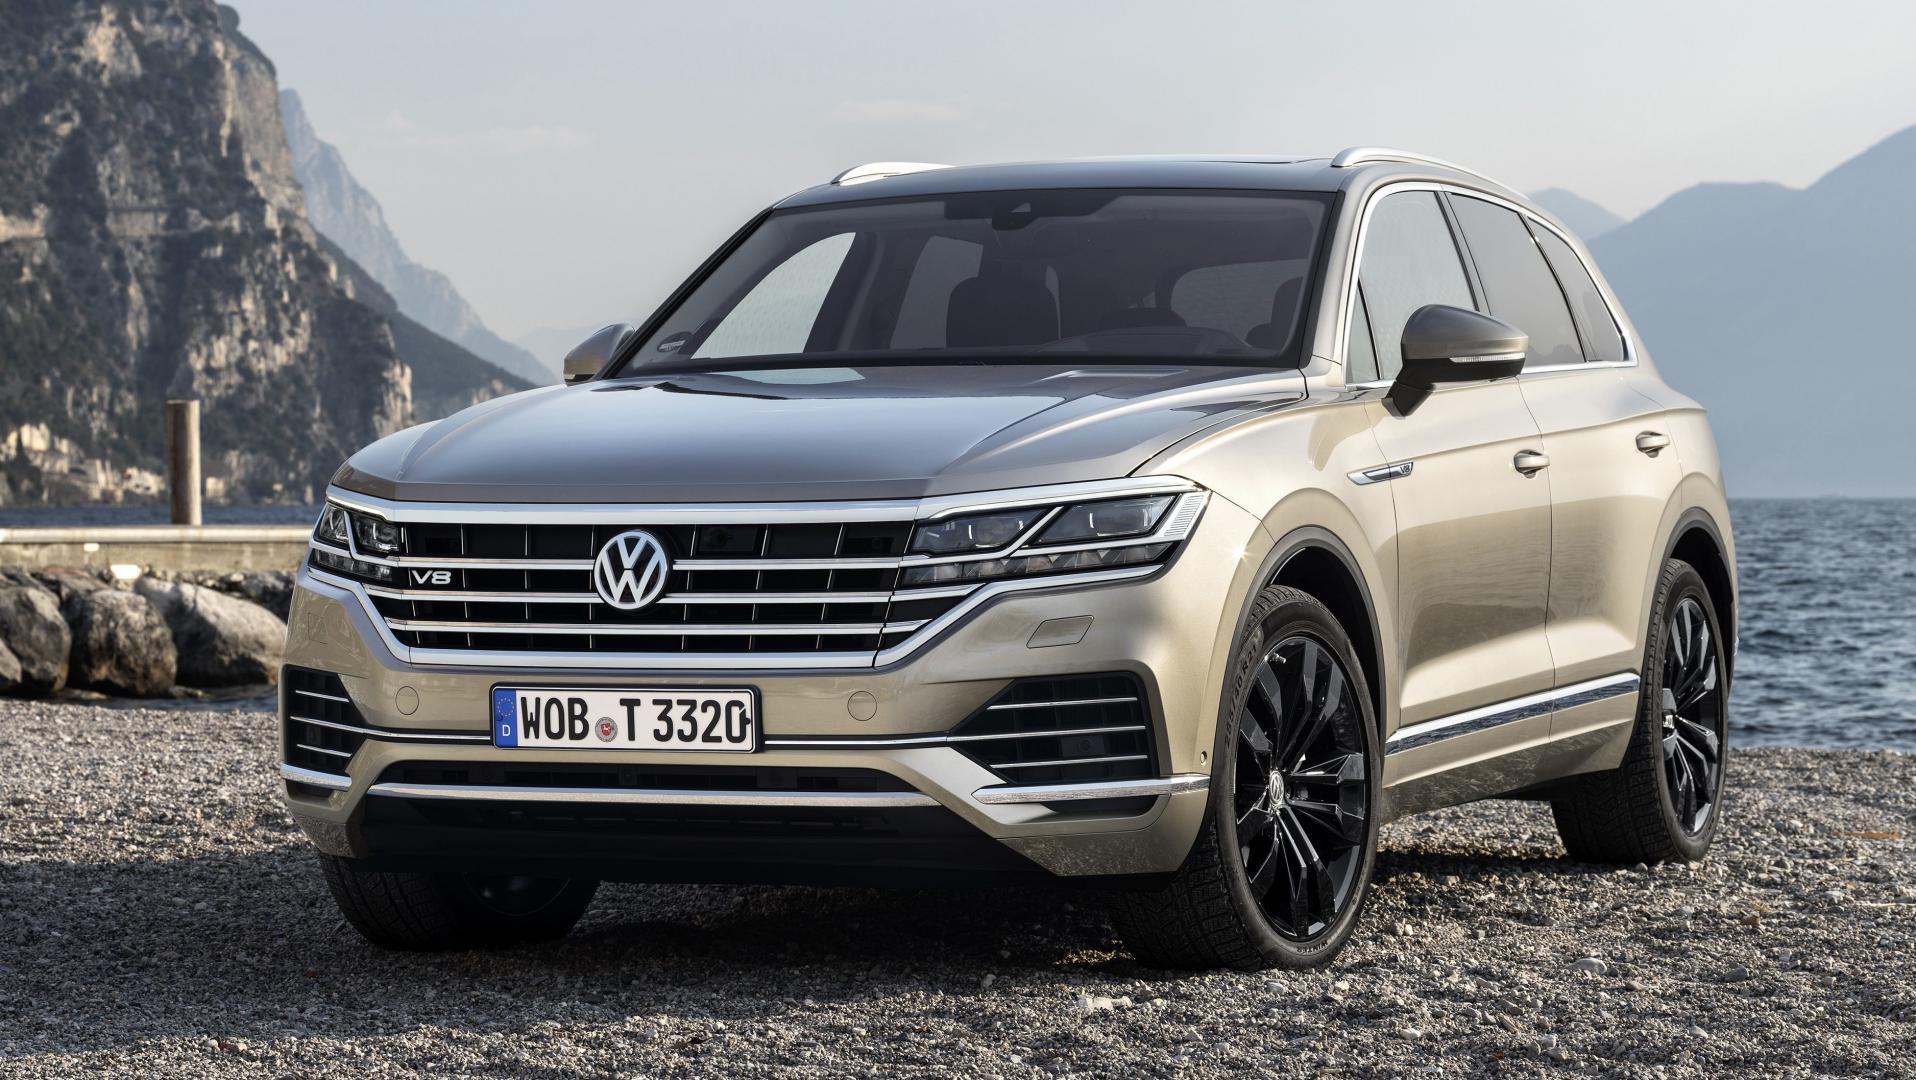 Volkswagen touareg 4.0 TDI